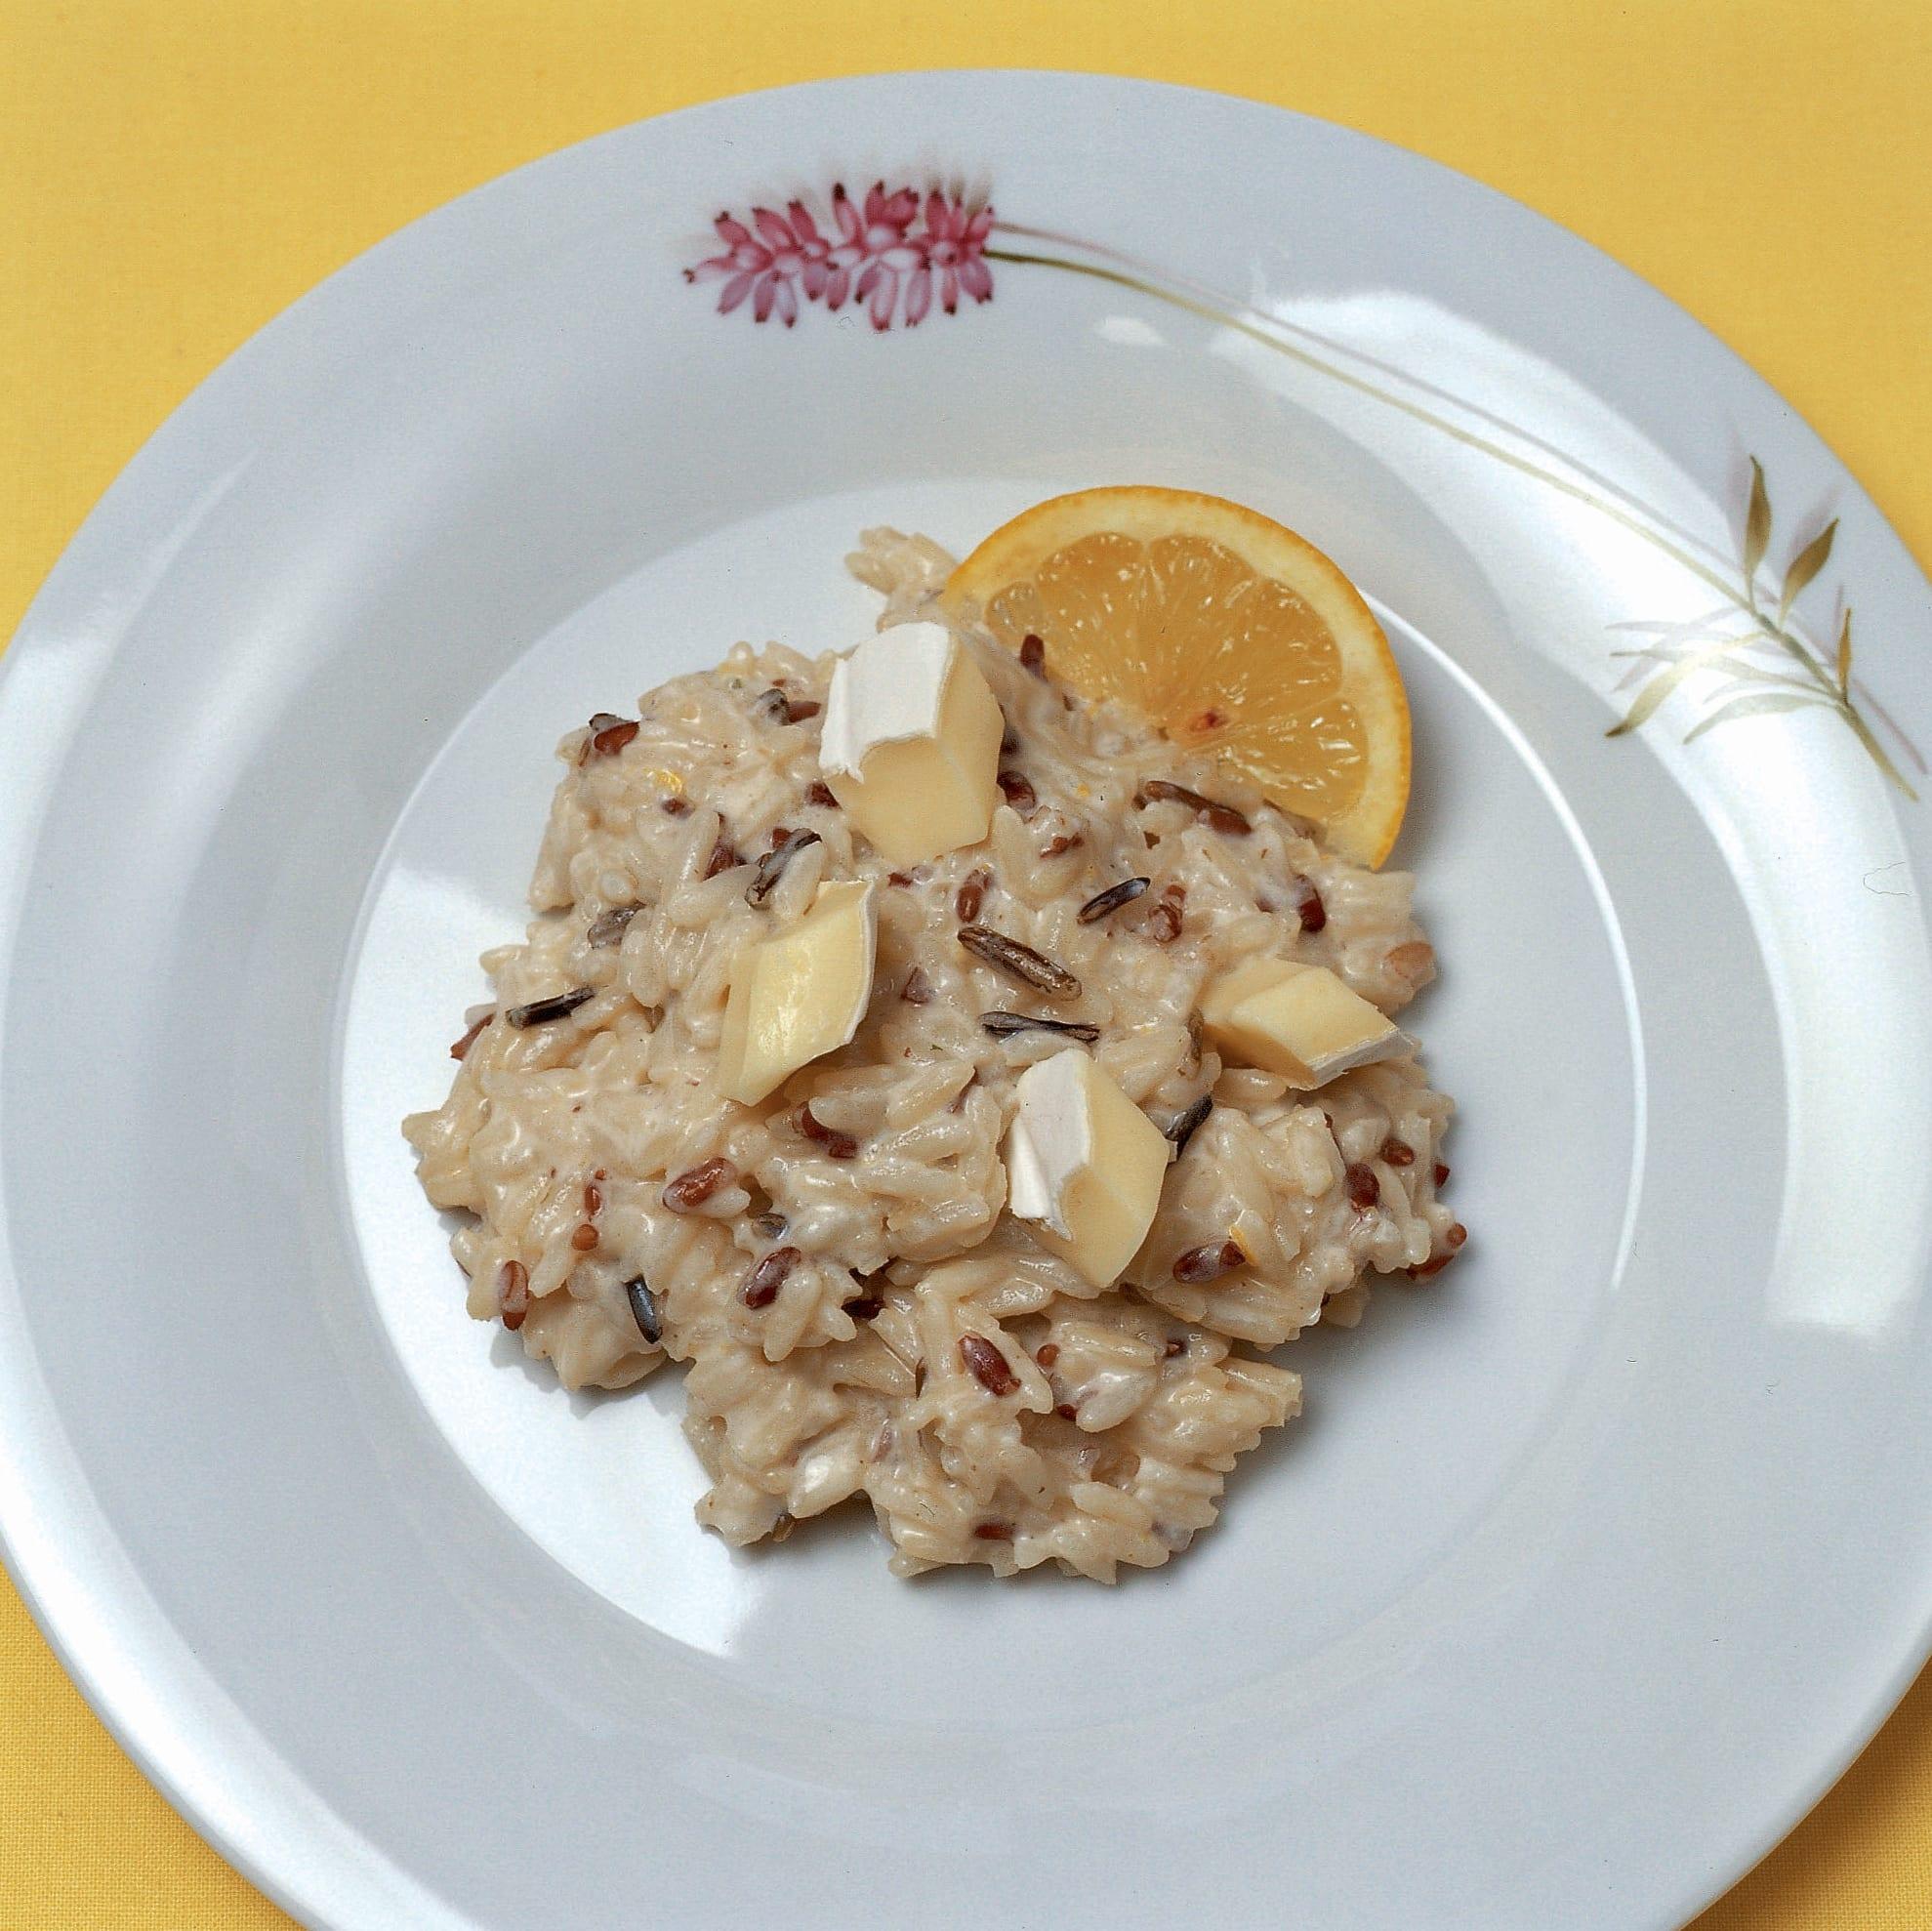 Crème-fraîche-Zitronen-Risotto